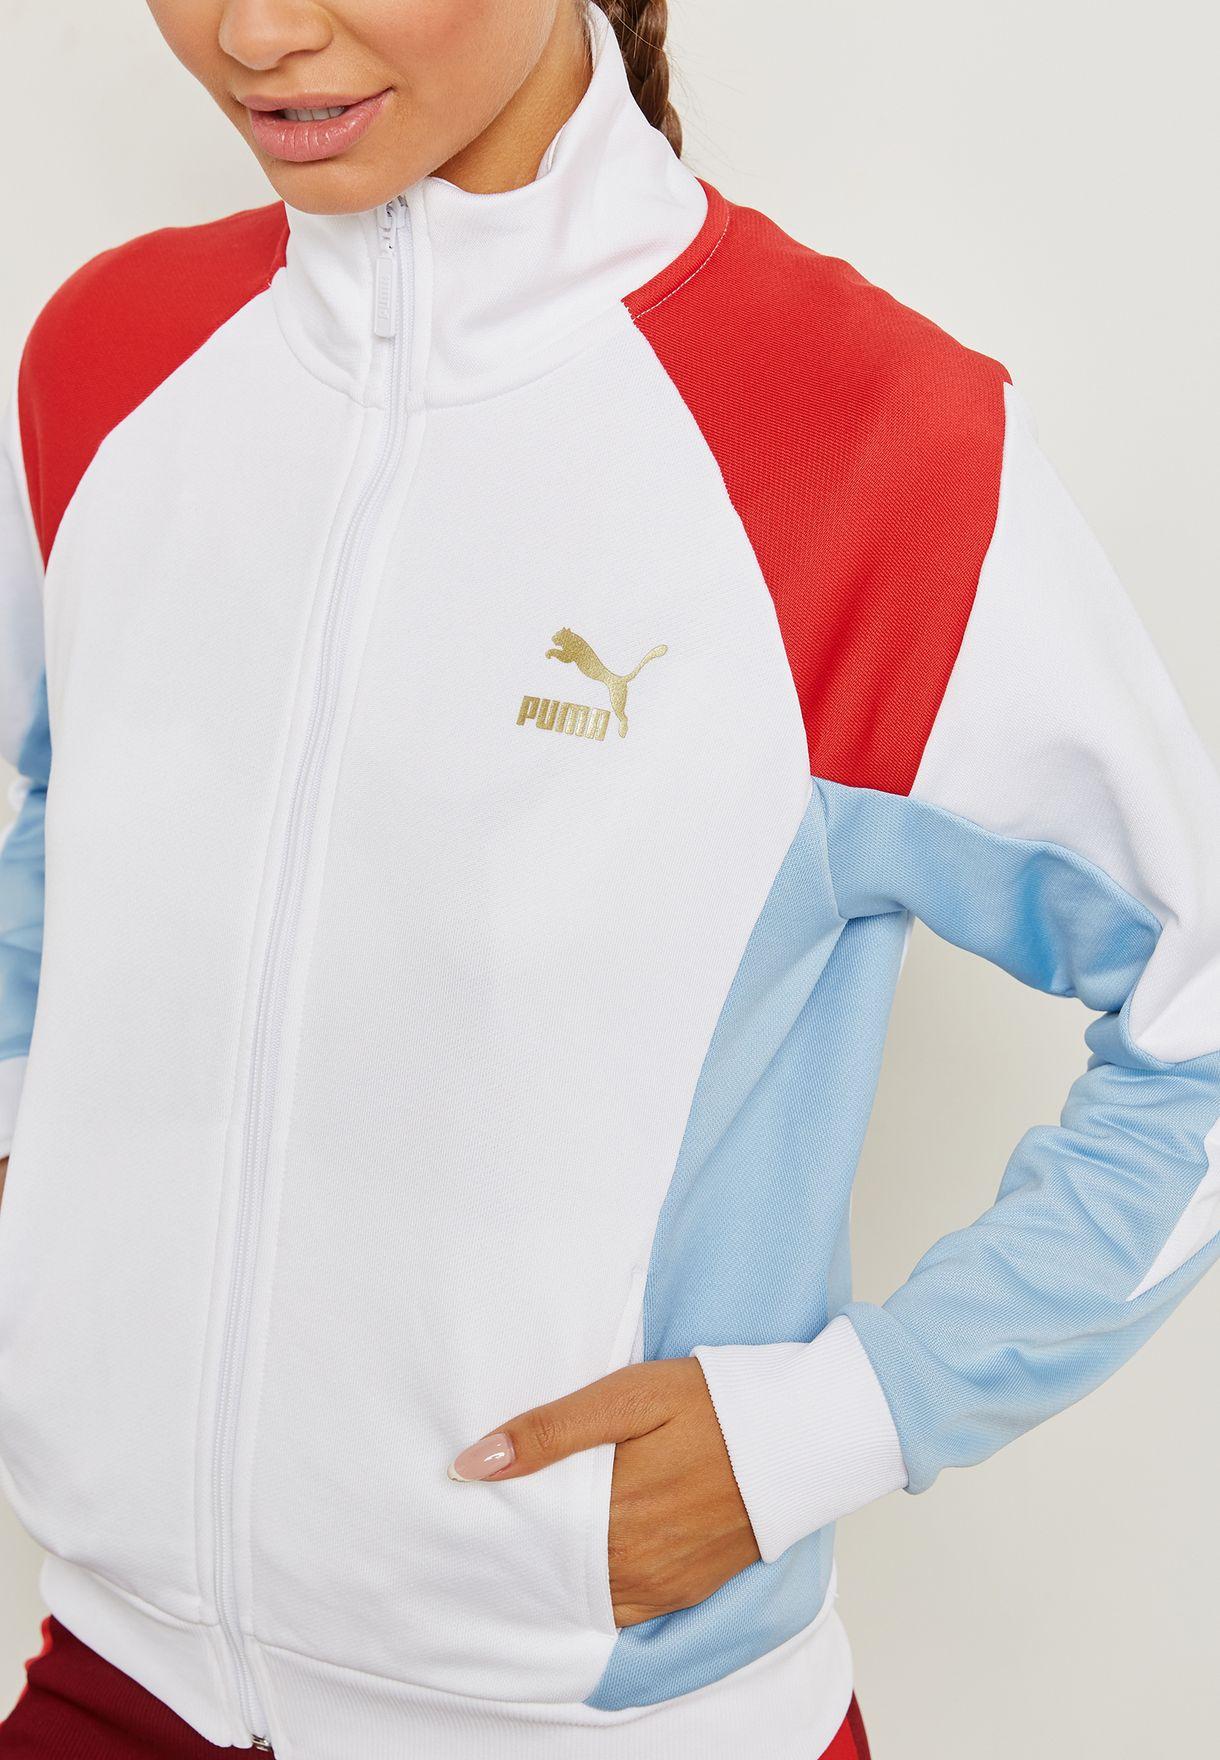 b1c41f867445 Shop PUMA white Retro Track Jacket 57651102 for Women in UAE ...